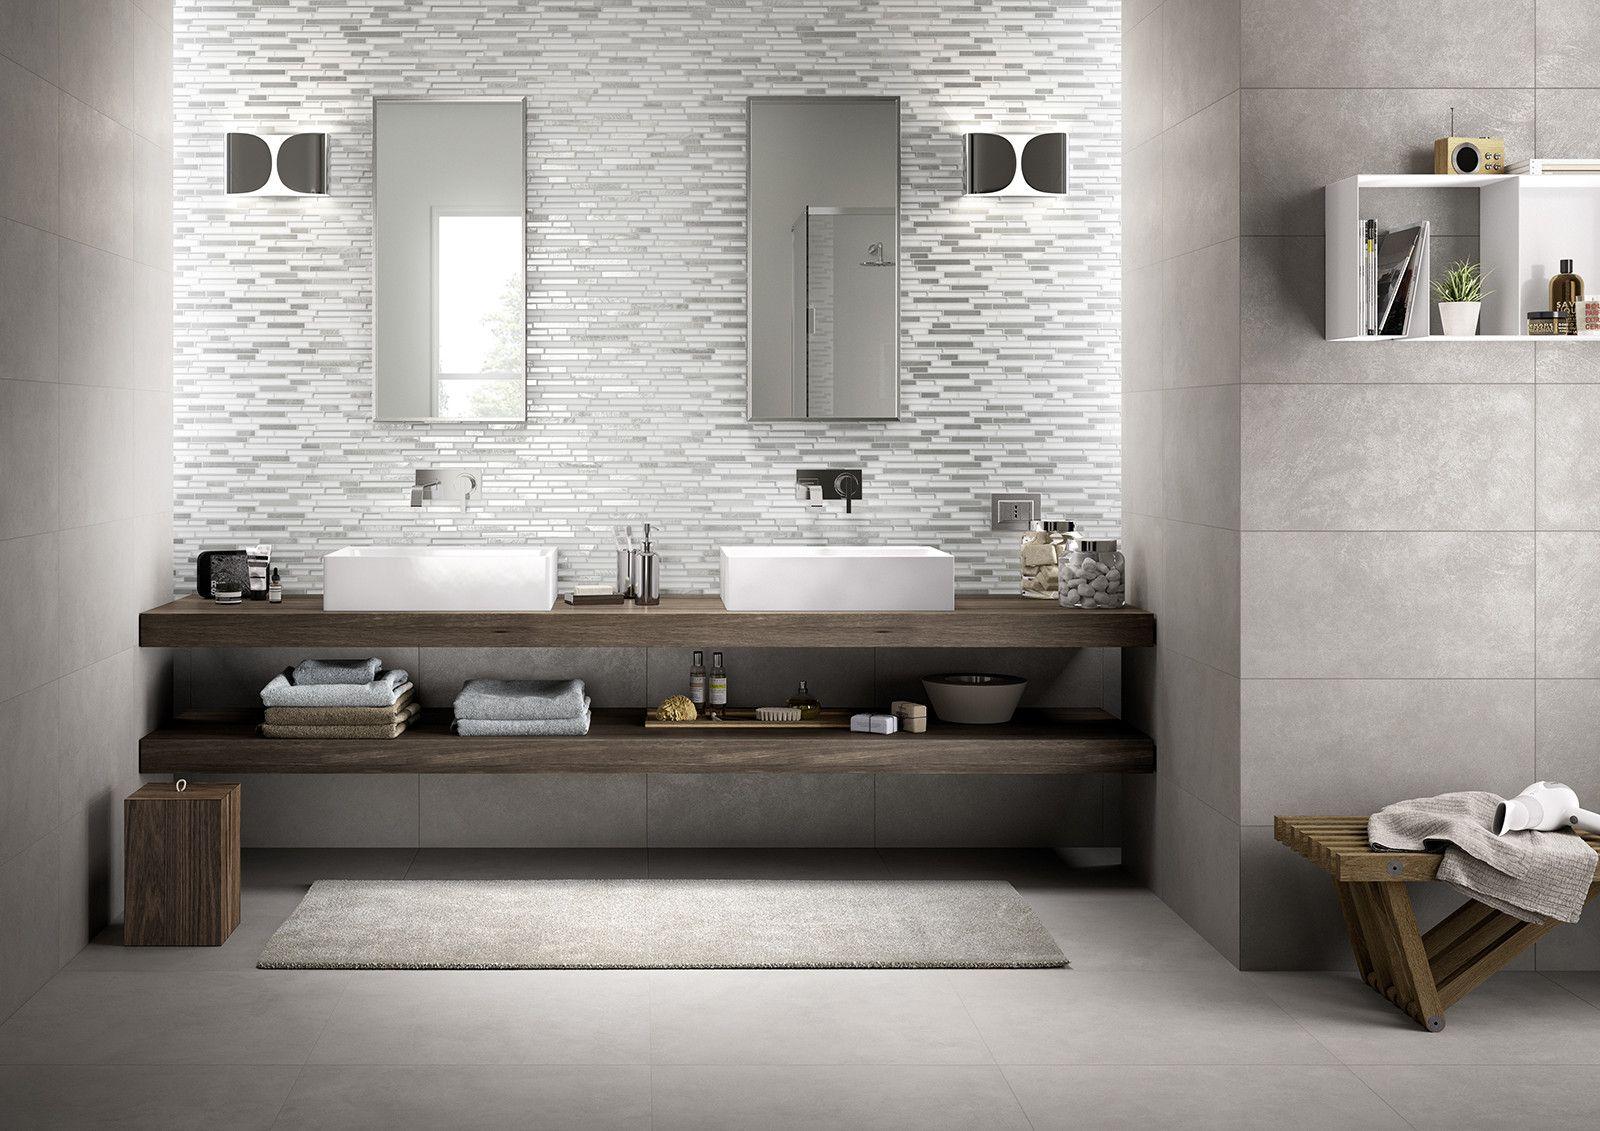 Marazzi Metal Mosaic Bianco 30x33 cm MLWM  Gres  su casaebagnoit a 98 Euromq  mosaico bagno cucina  Marazzi  Bathroom Furniture